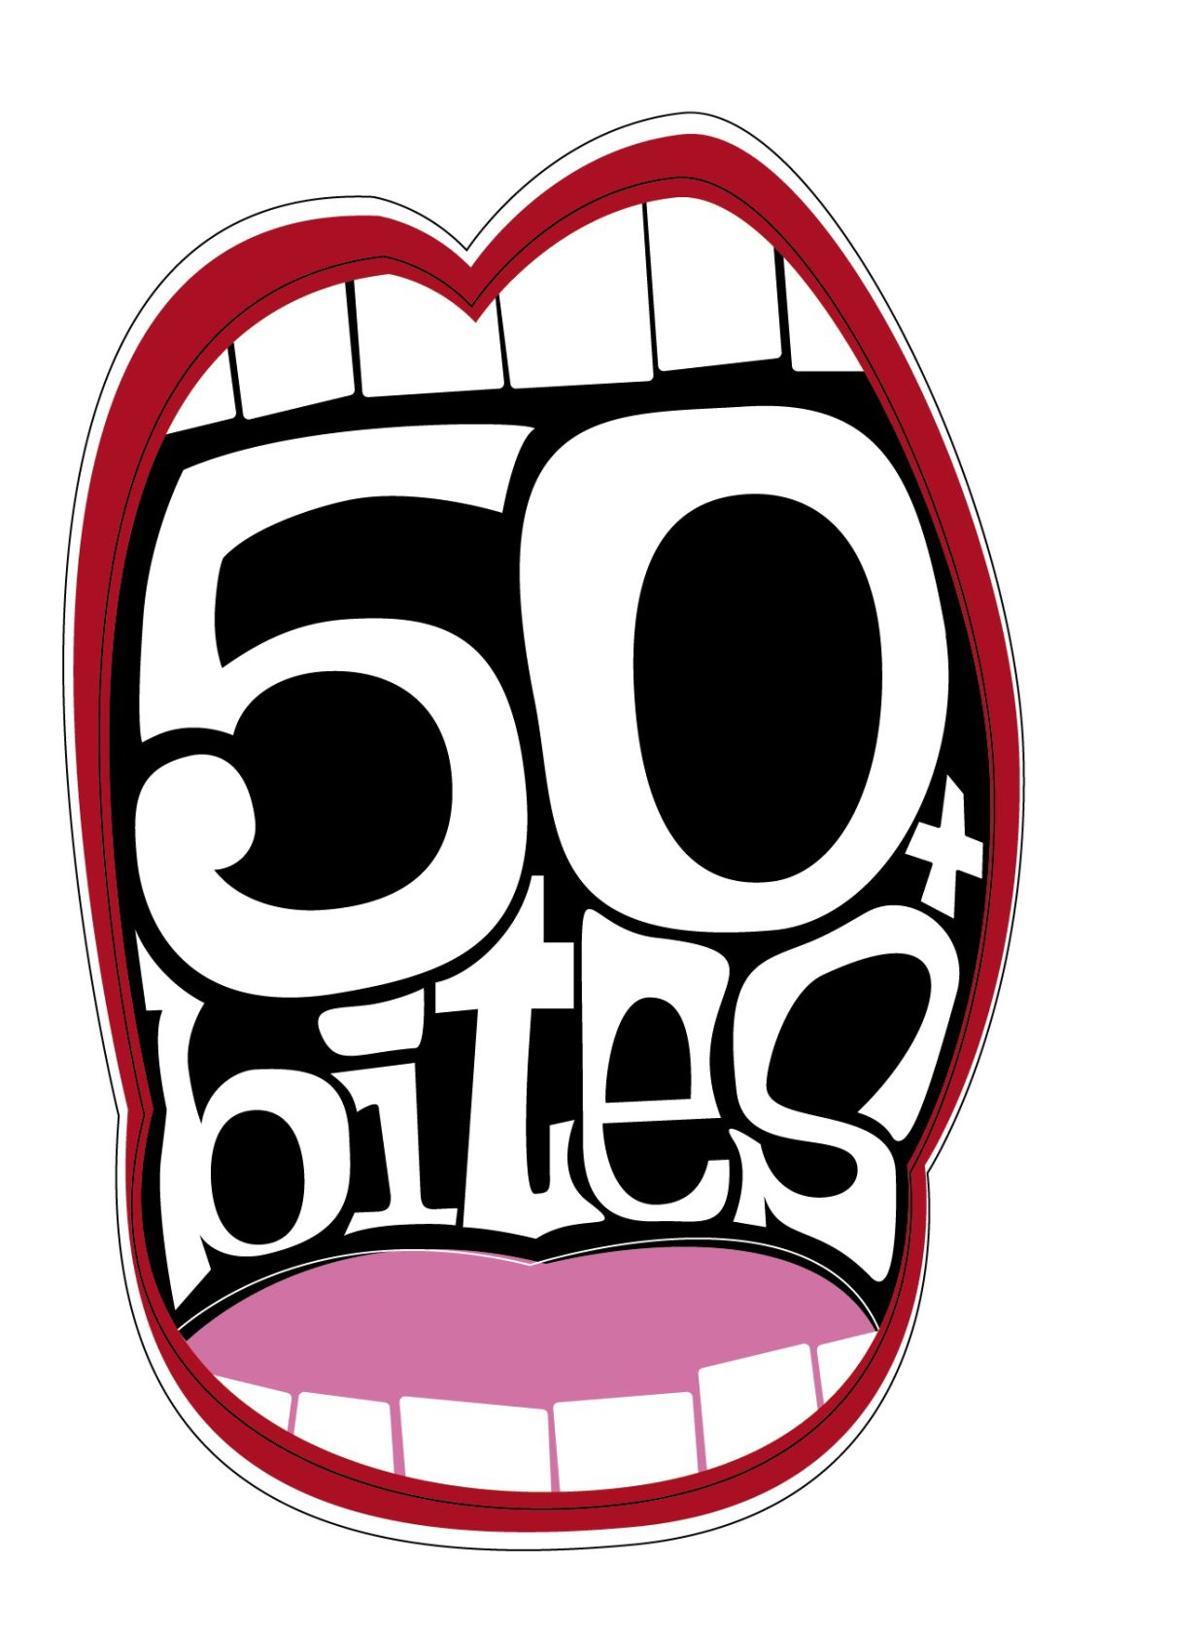 50 Bites